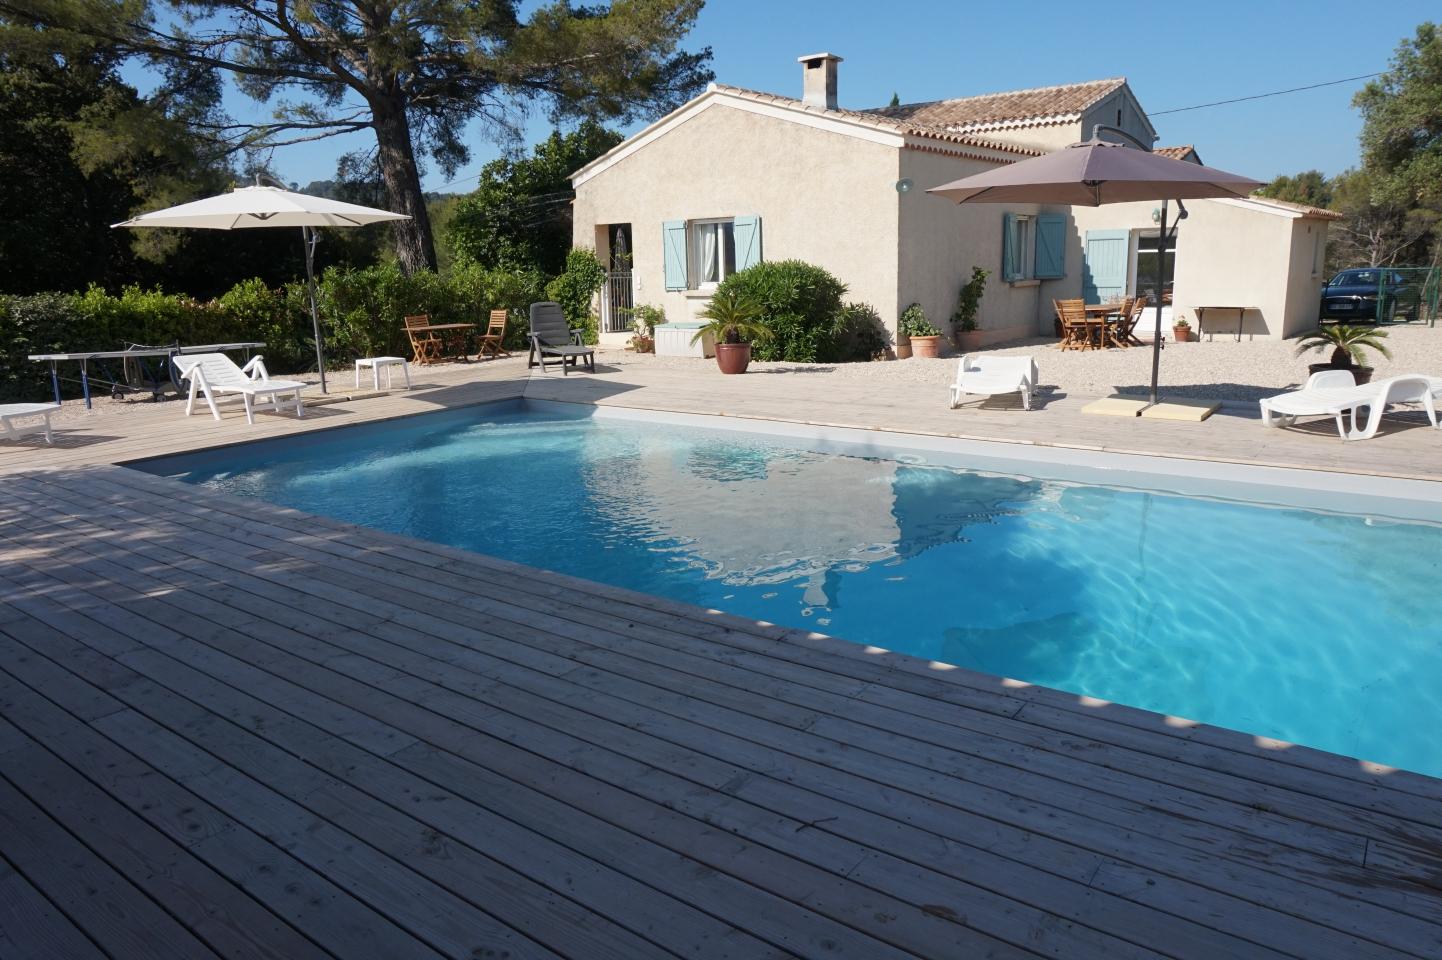 La Balmee Location Saisonnière Villa -Villa For 7 People In ... concernant Location Maison Portugal Piscine